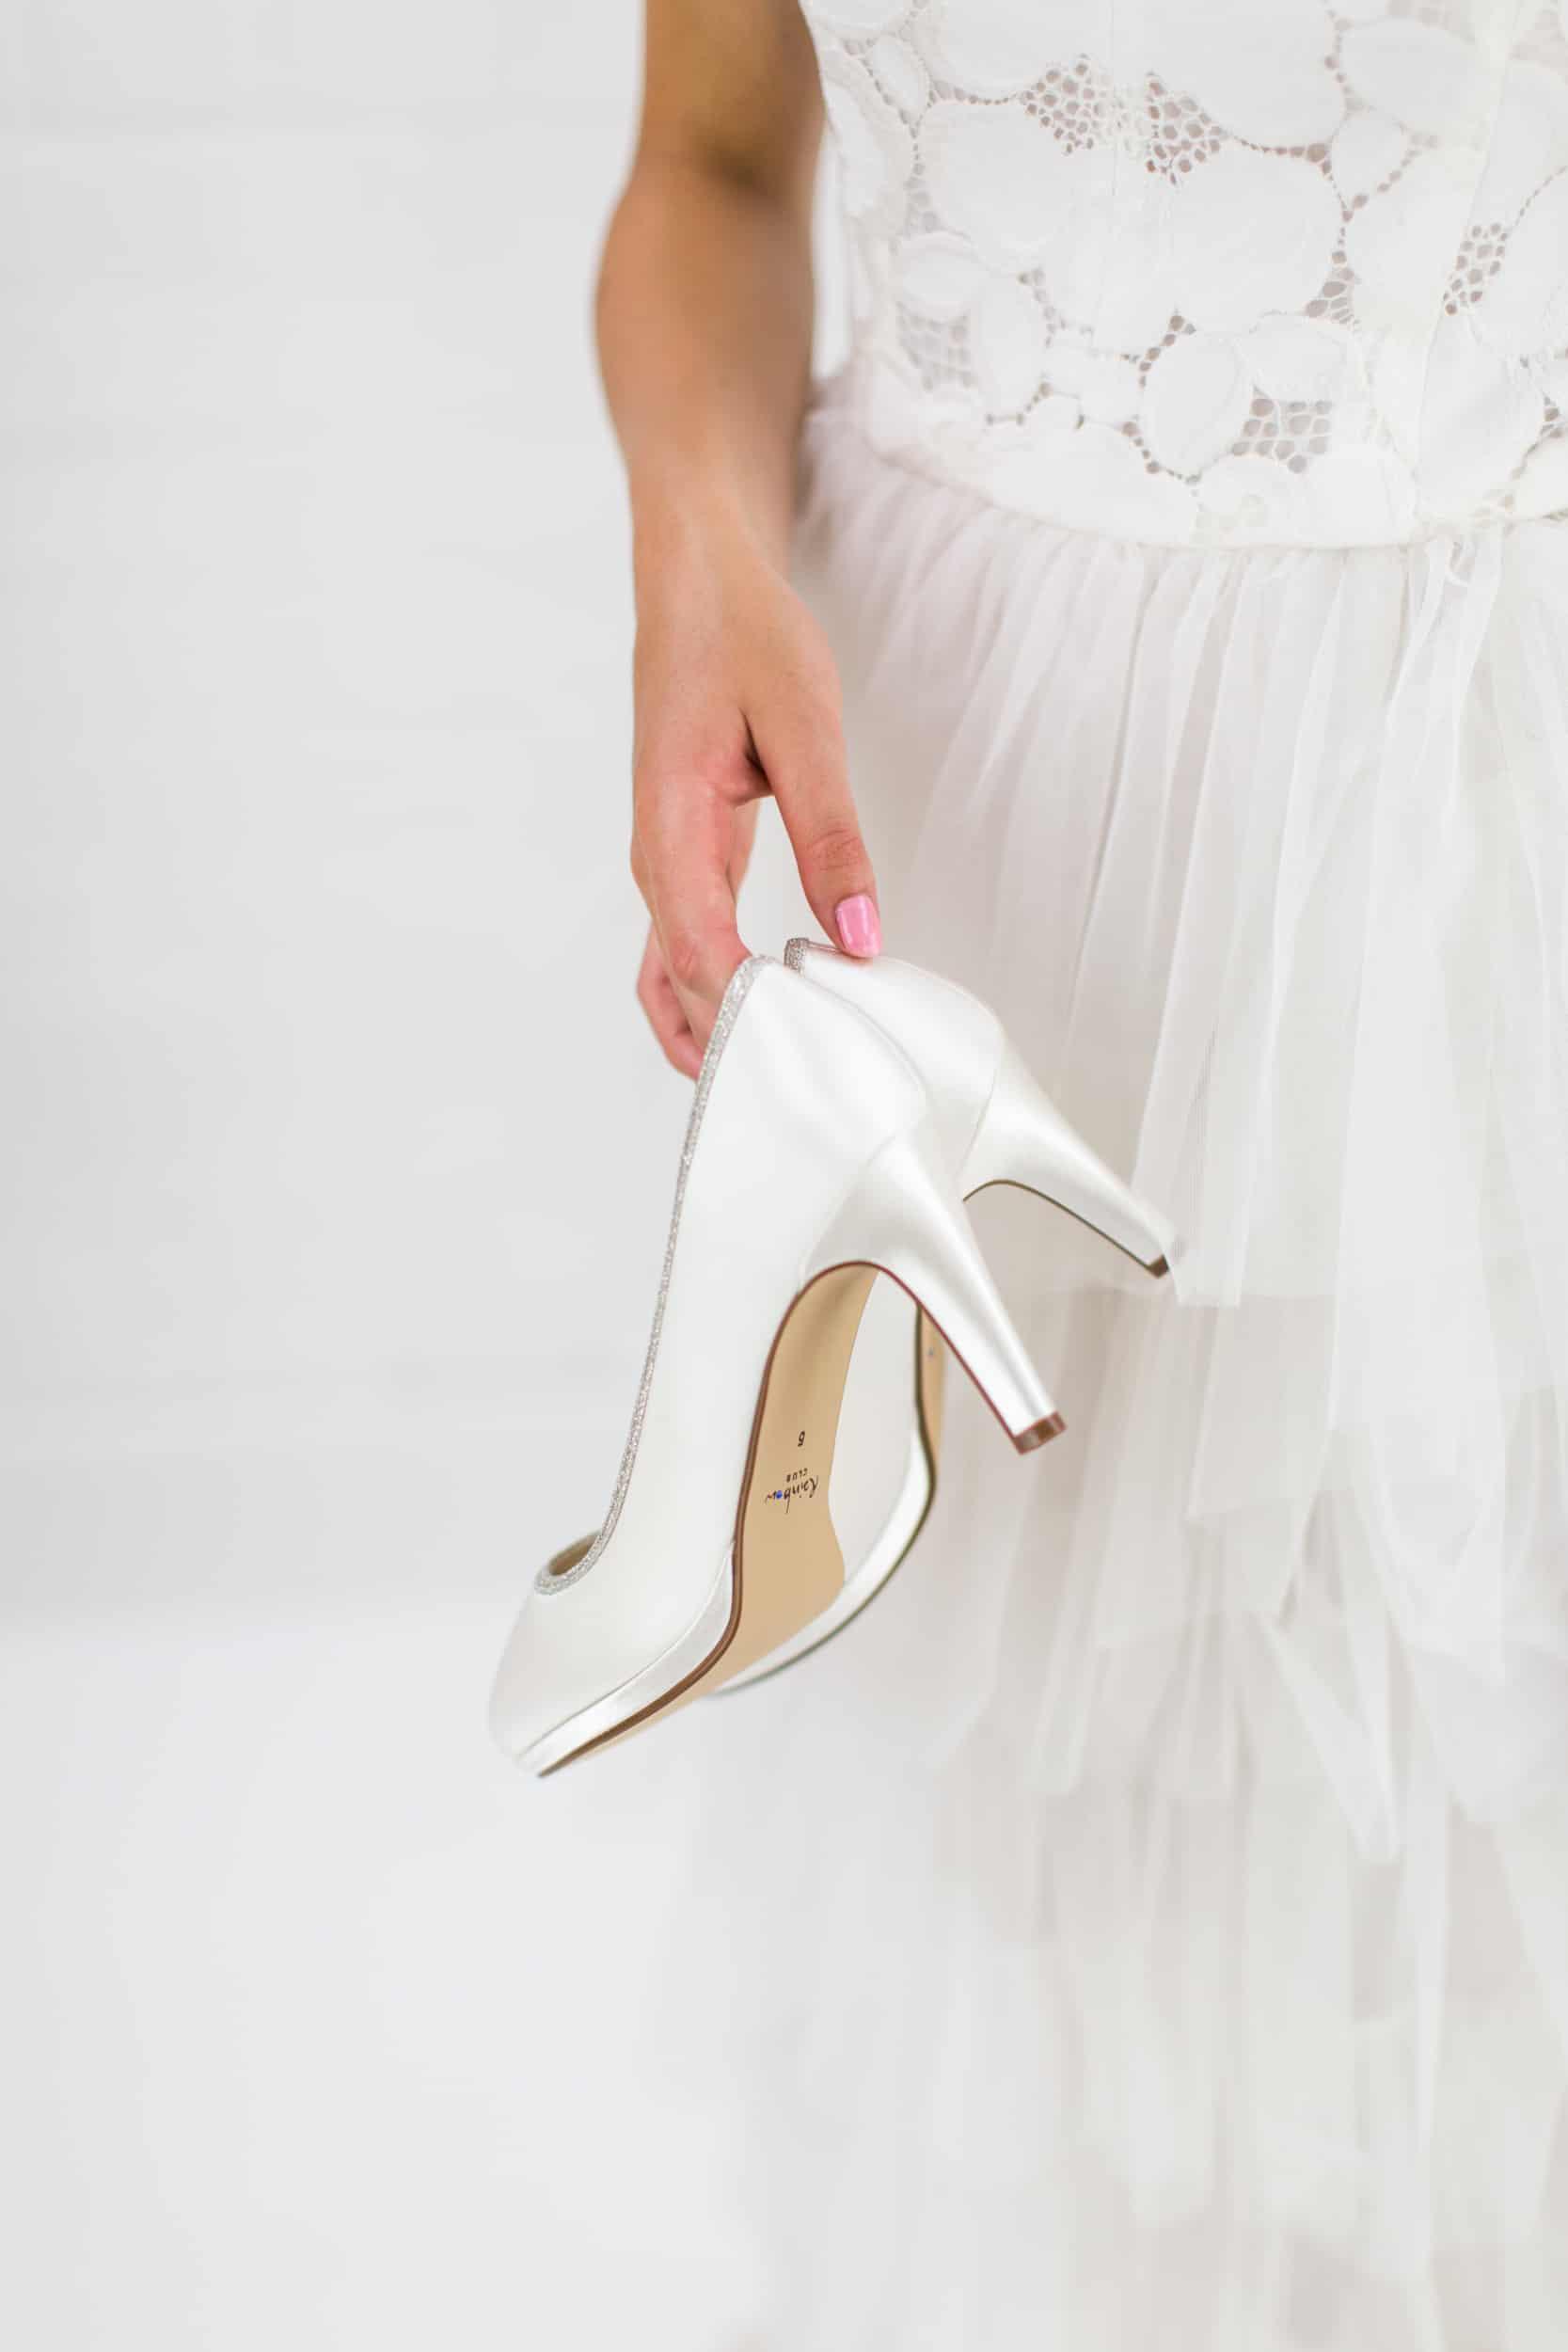 Bruidsschoenen Trouwschoenen Sneakers Pumps Yanna hoge hakken